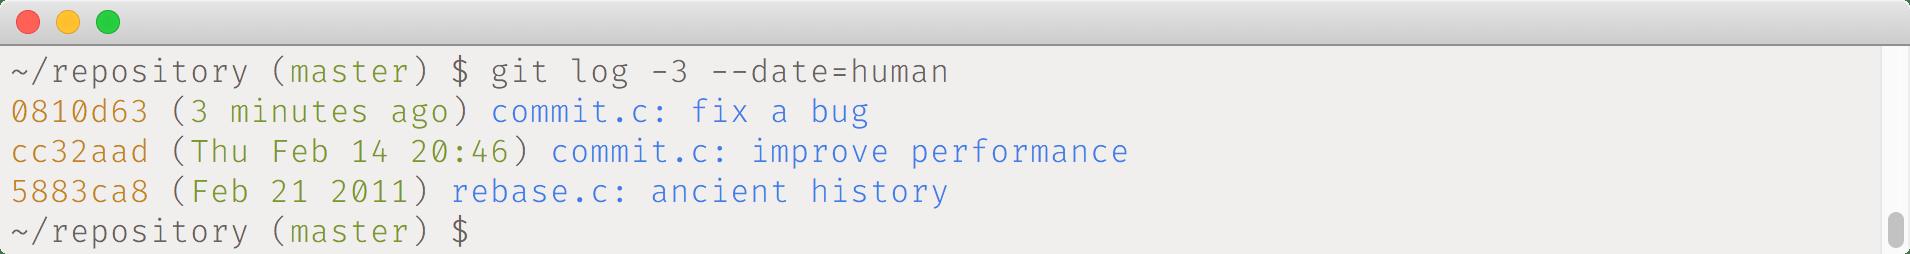 git log --date=human example